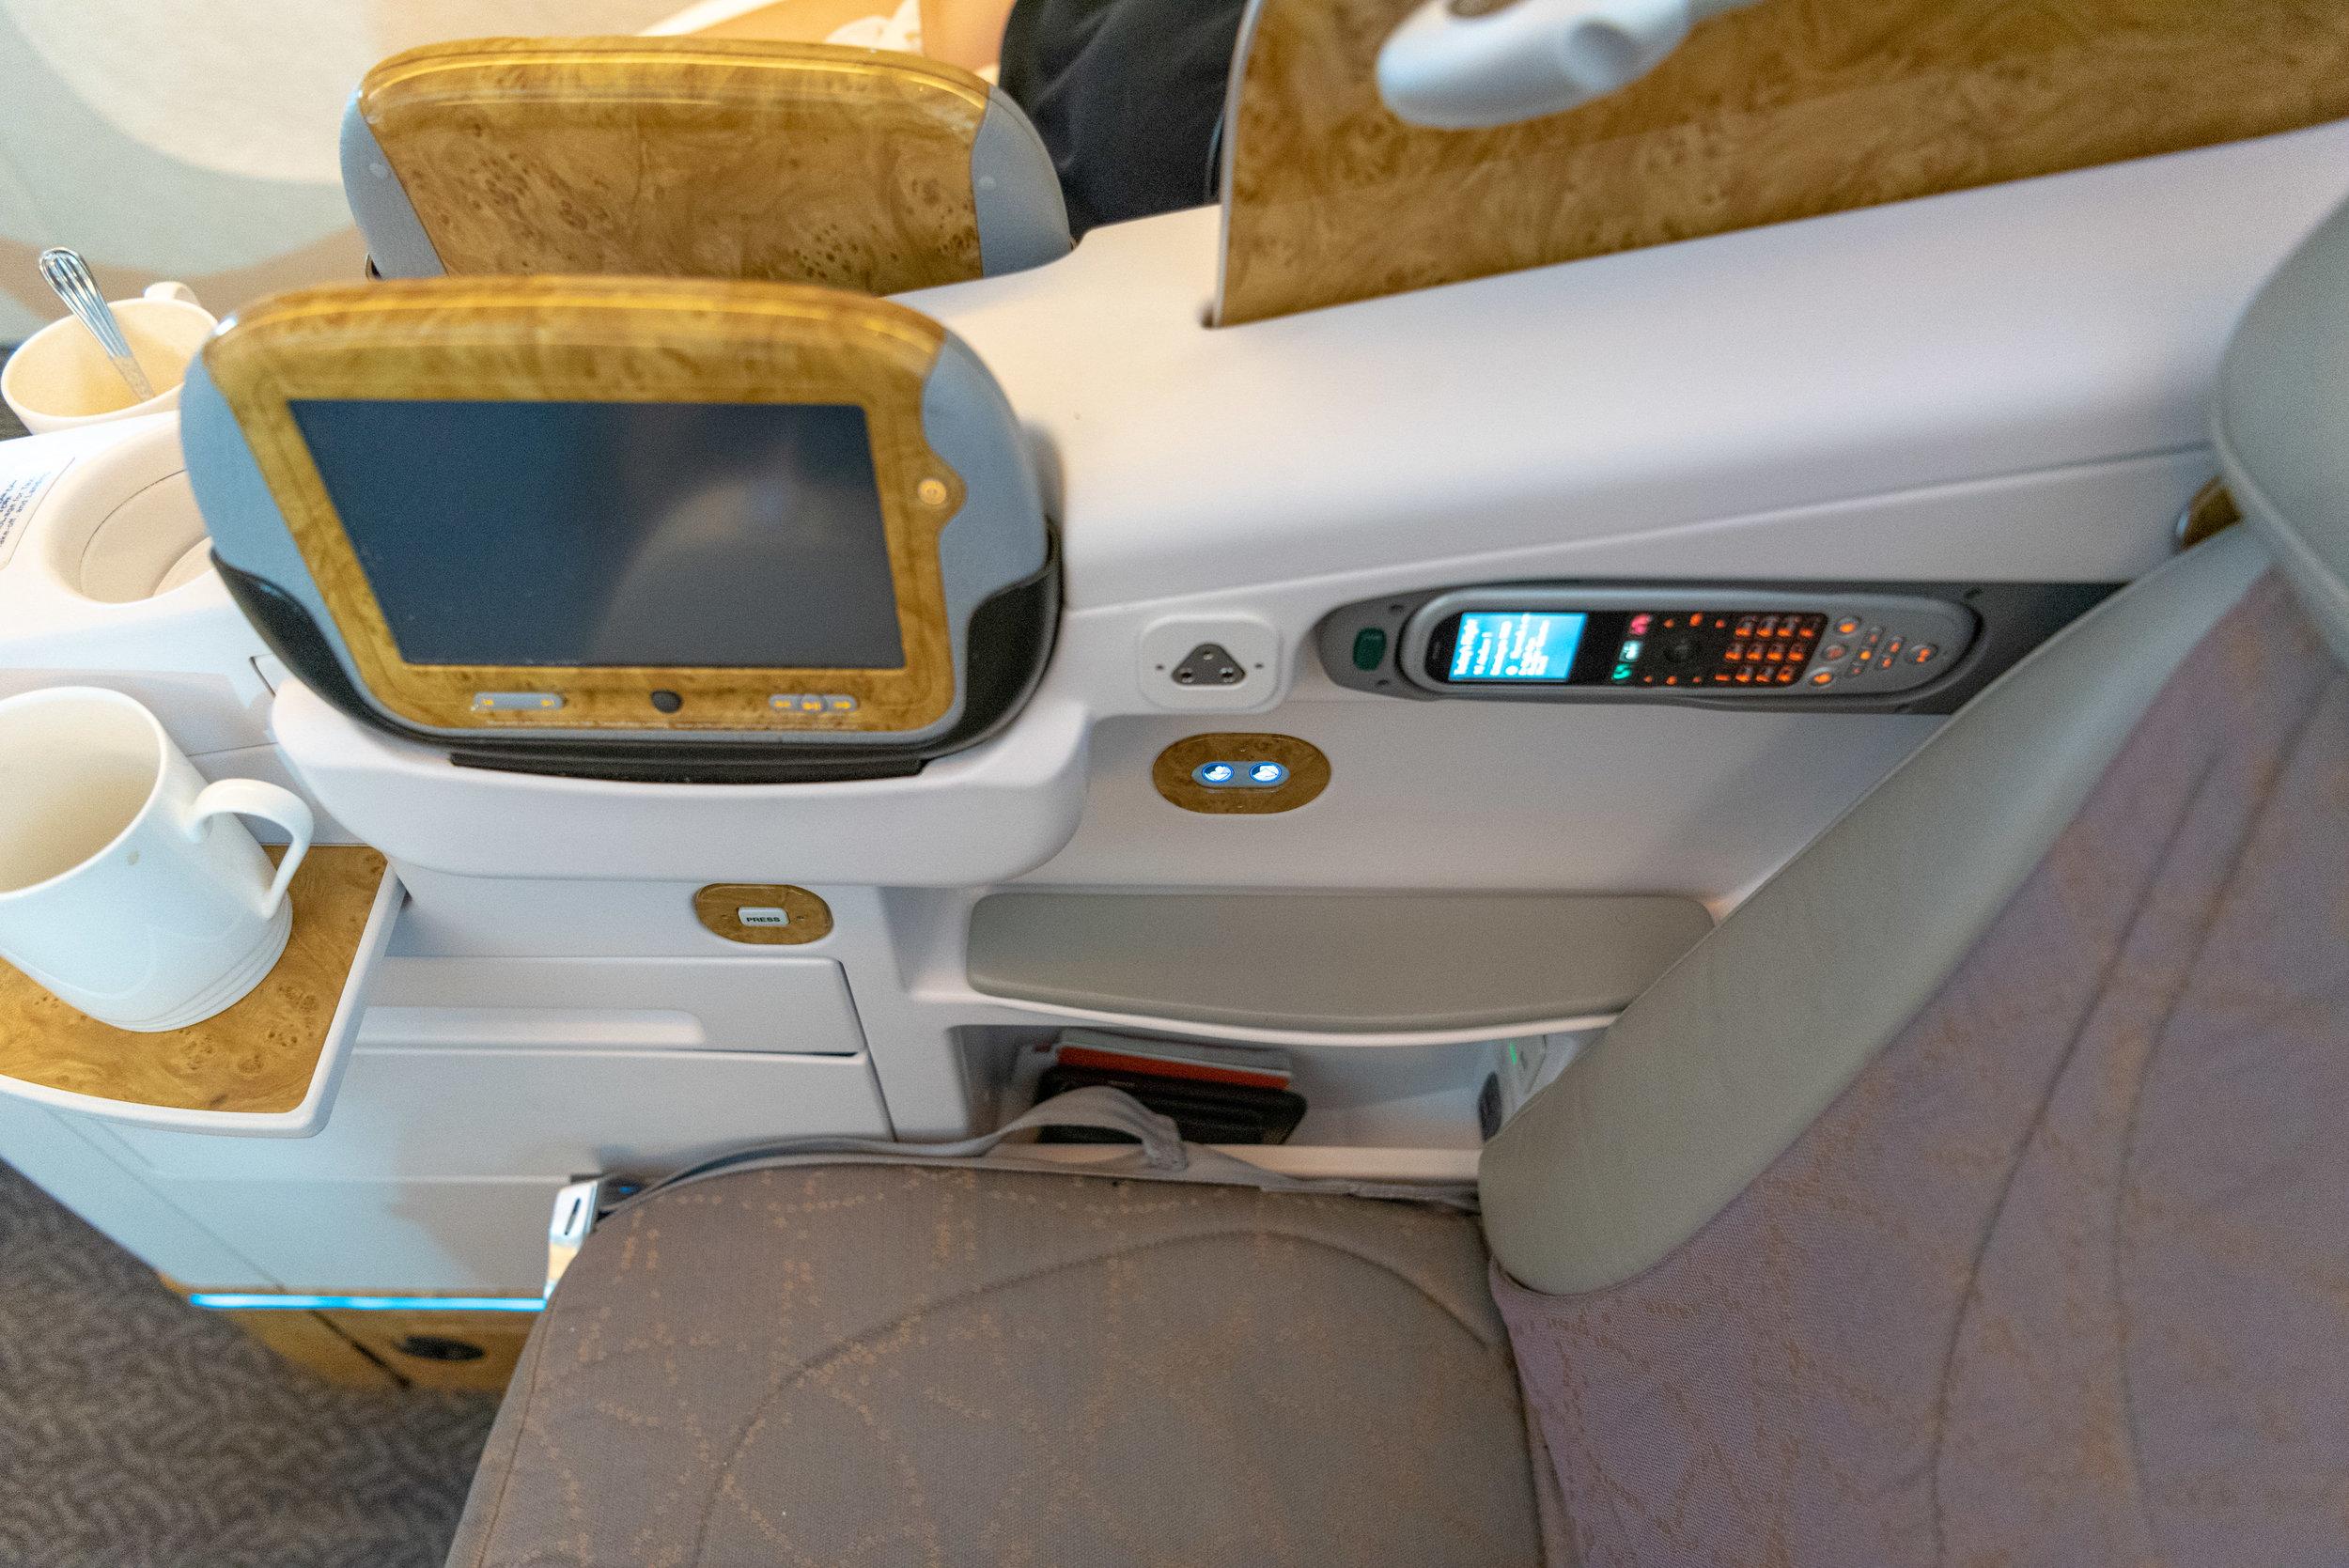 Seat 9J  Emirates EK352 Business Class 777-300ER - DXB to SIN